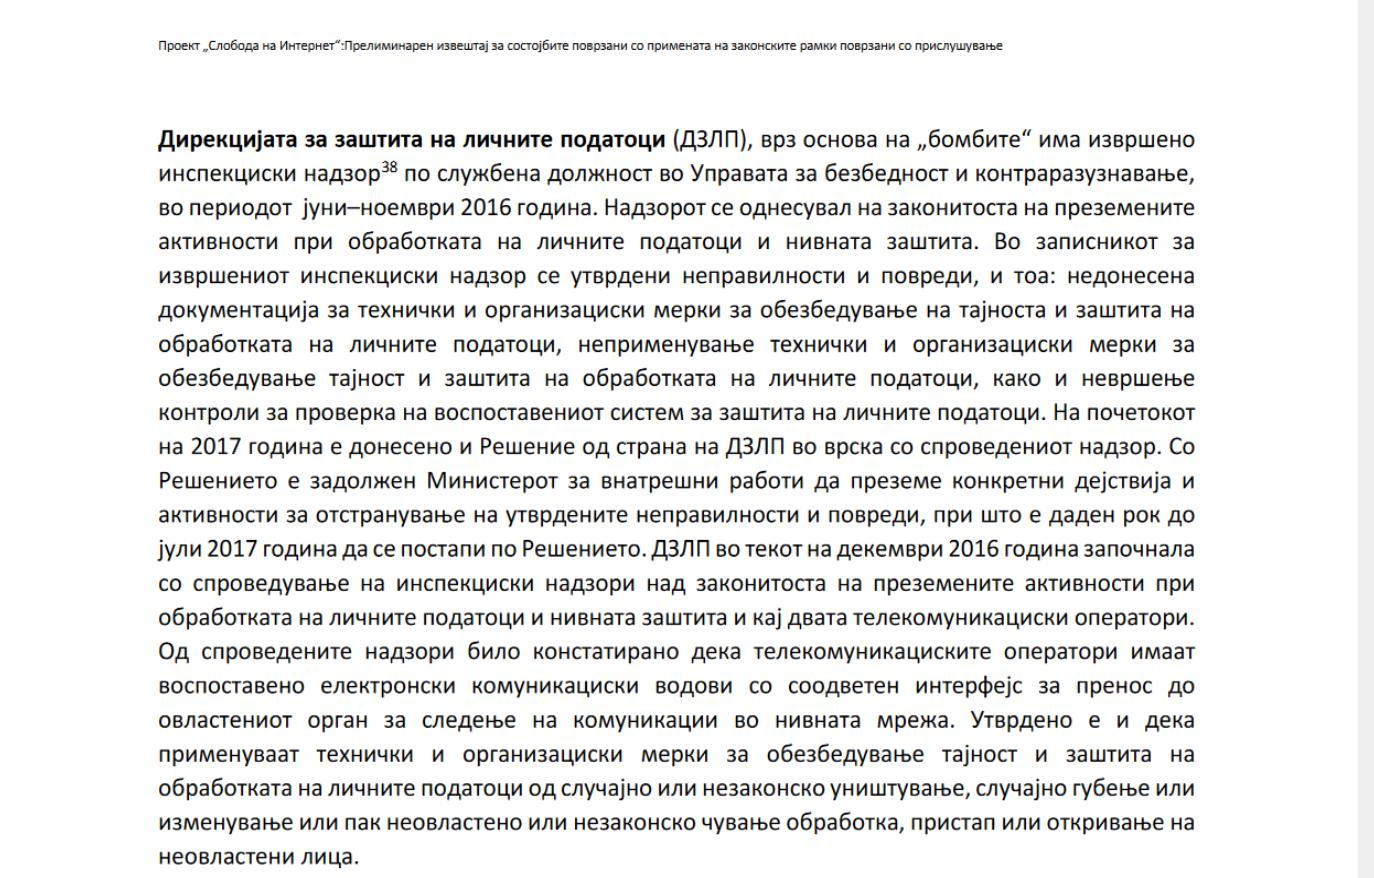 [Image: Metamorfozis_10.png]